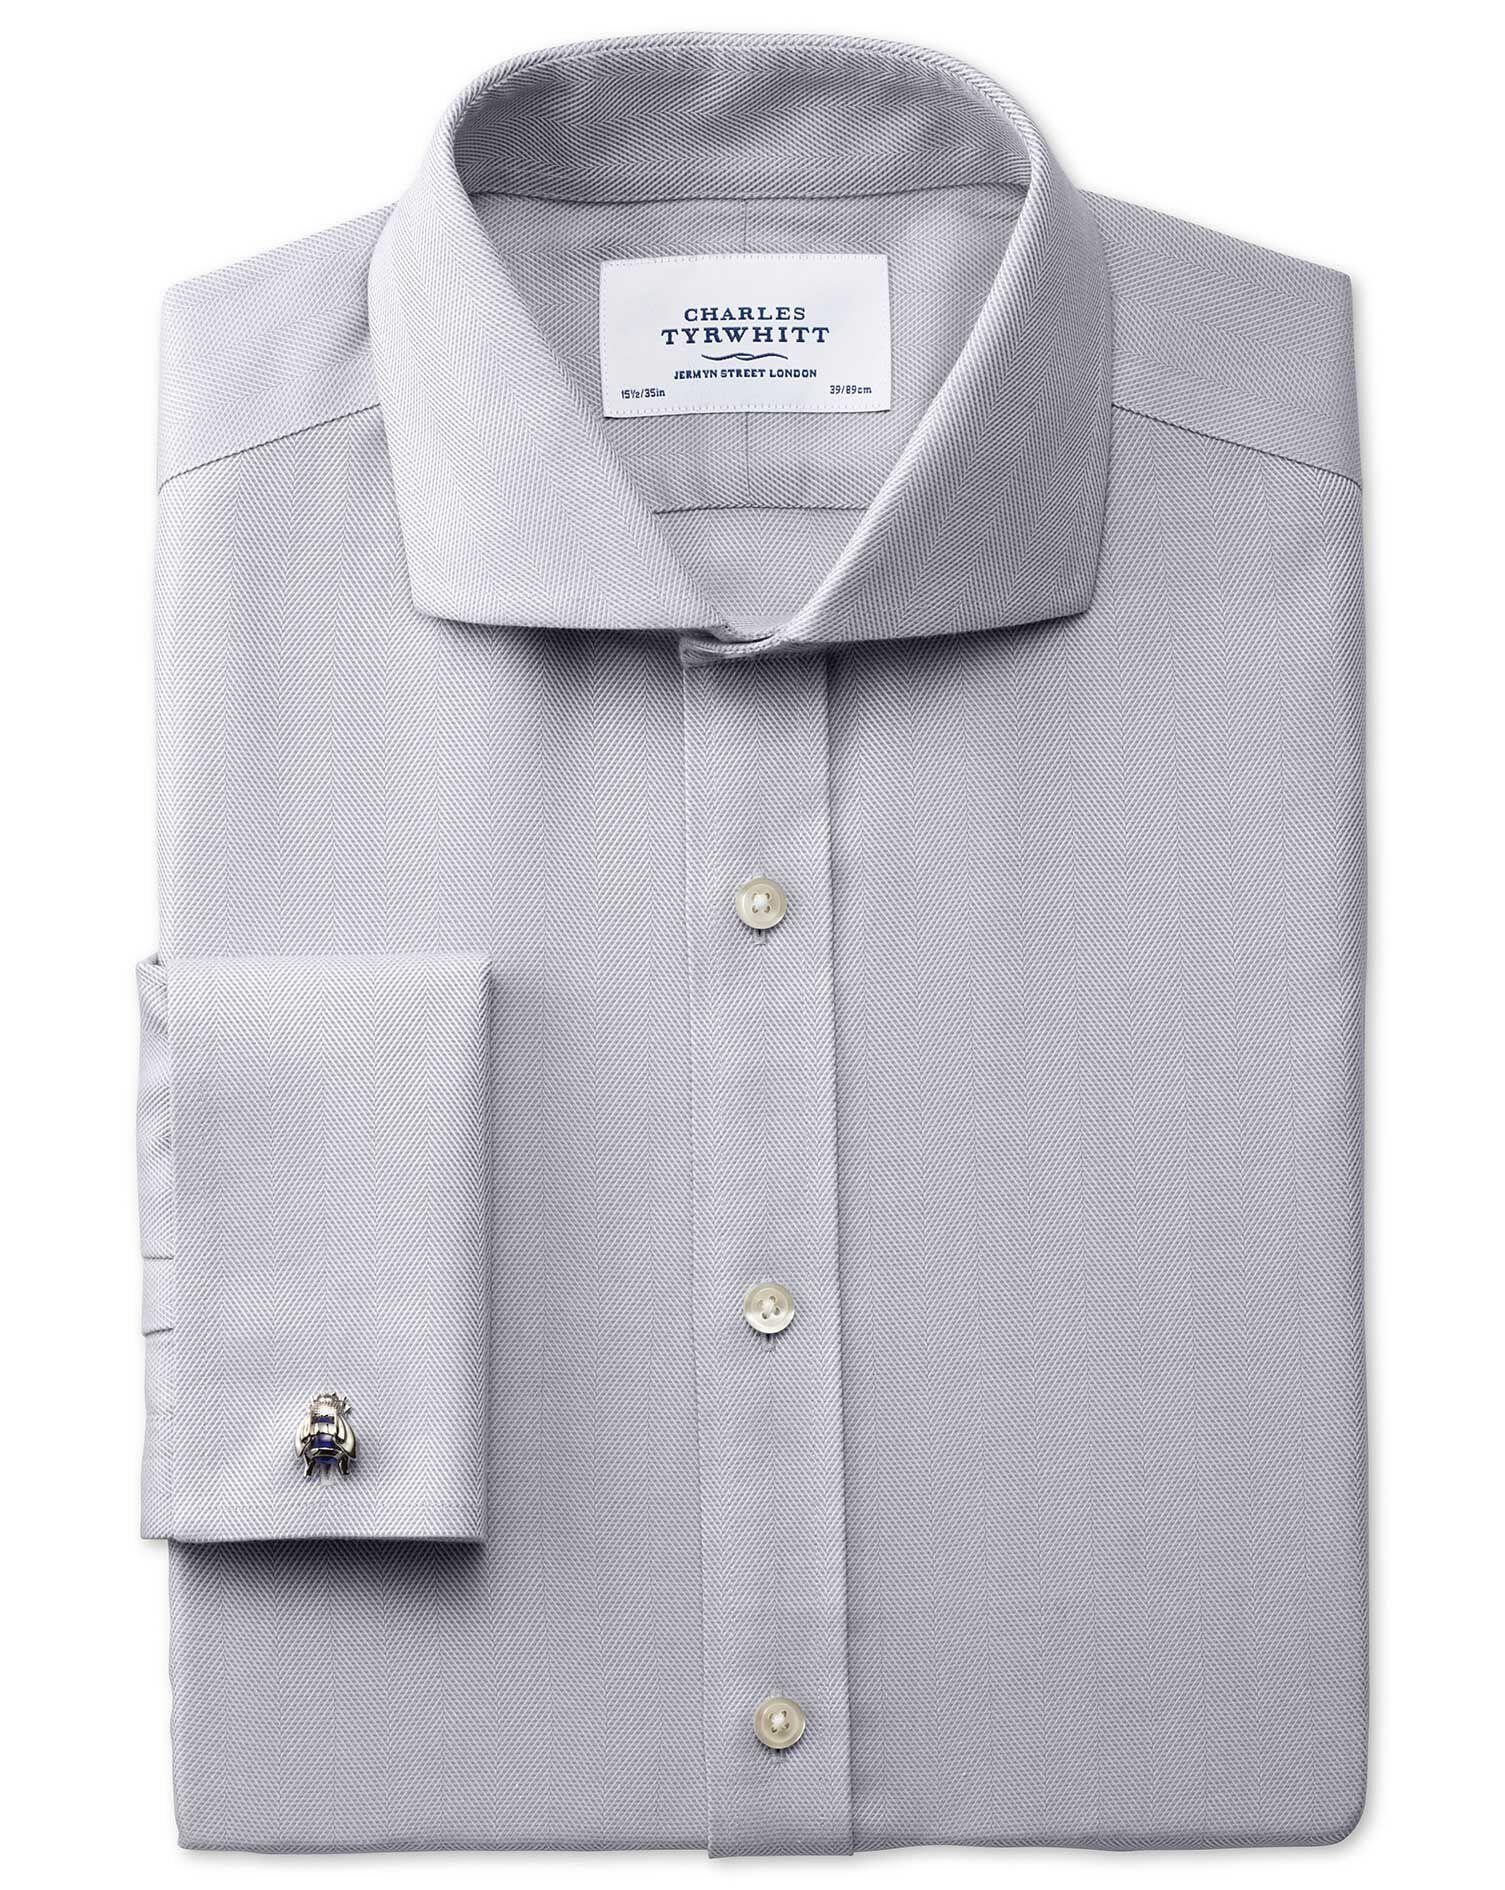 Extra Slim Fit Cutaway Collar Non-Iron Herringbone Grey Cotton Formal Shirt Single Cuff Size 15/33 b